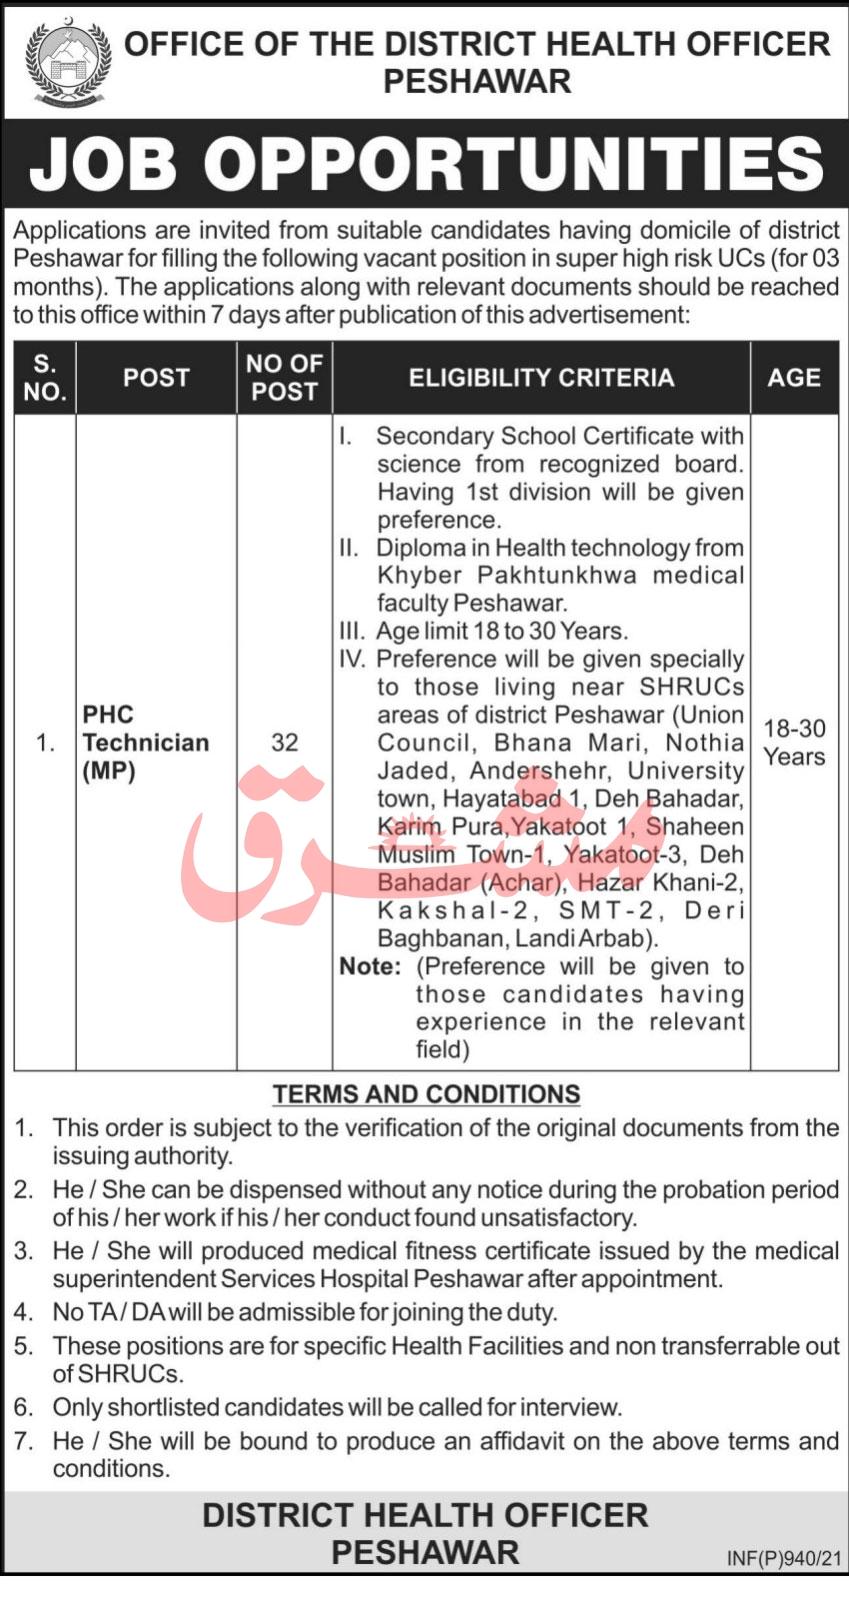 Health Department Jobs 2021 in Pakistan - PHC Technician Jobs 2021 - Medical Jobs 2021 - Latest KPK Jobs 2021 - Jobs in Peshawar 2021